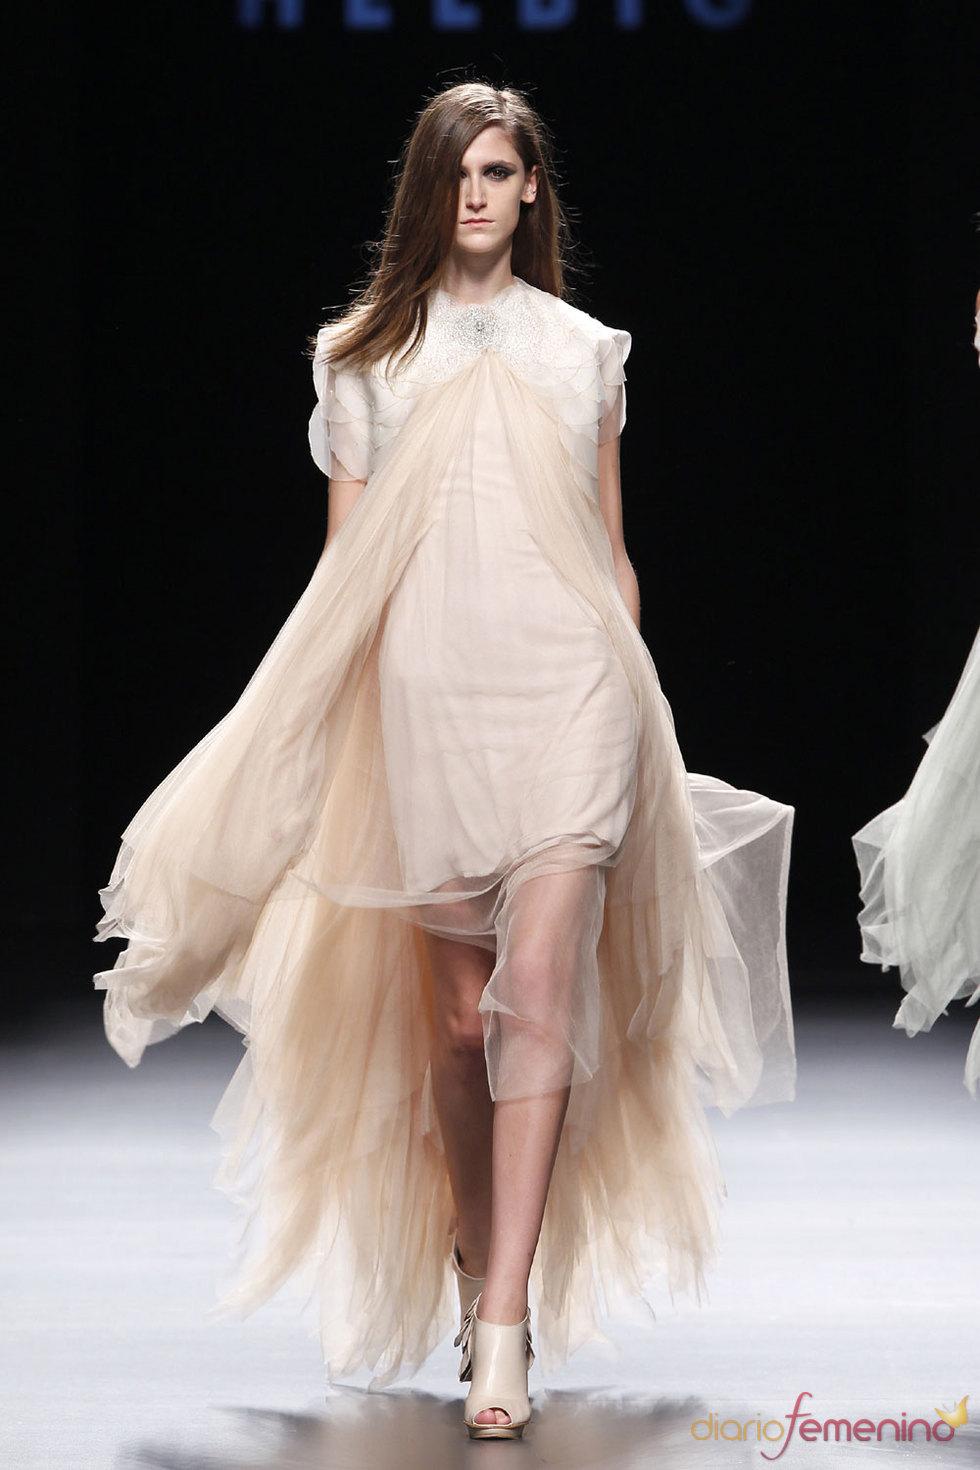 Teresa Helbig - Moda femenina en la Pasarela Cibeles 2010